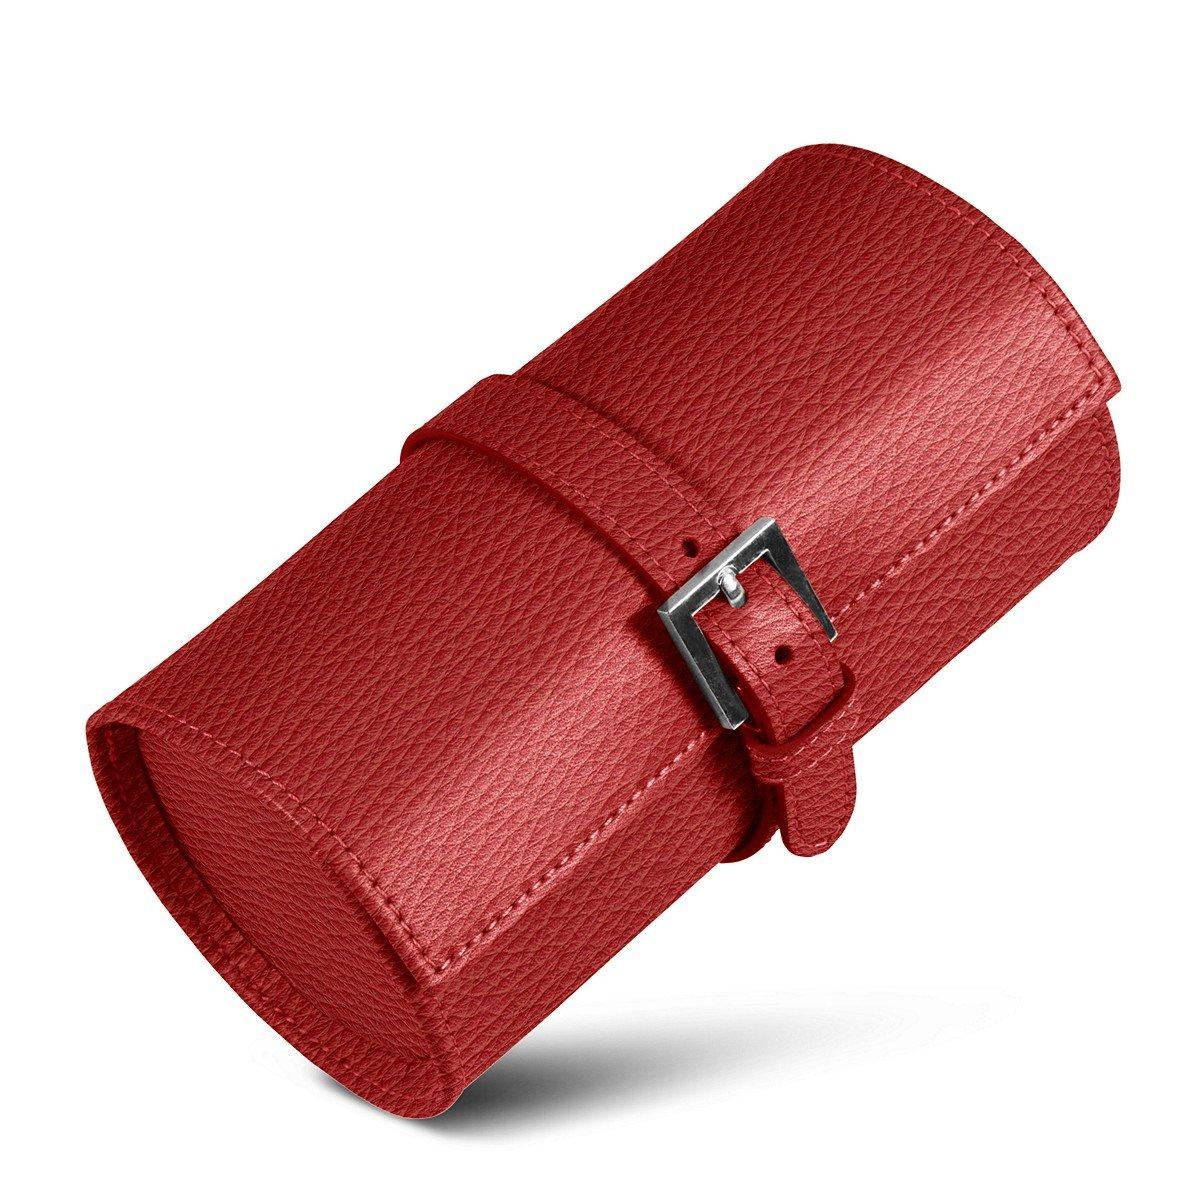 Lucrin - Runden Uhrboxen - Rot - Leder genarbt